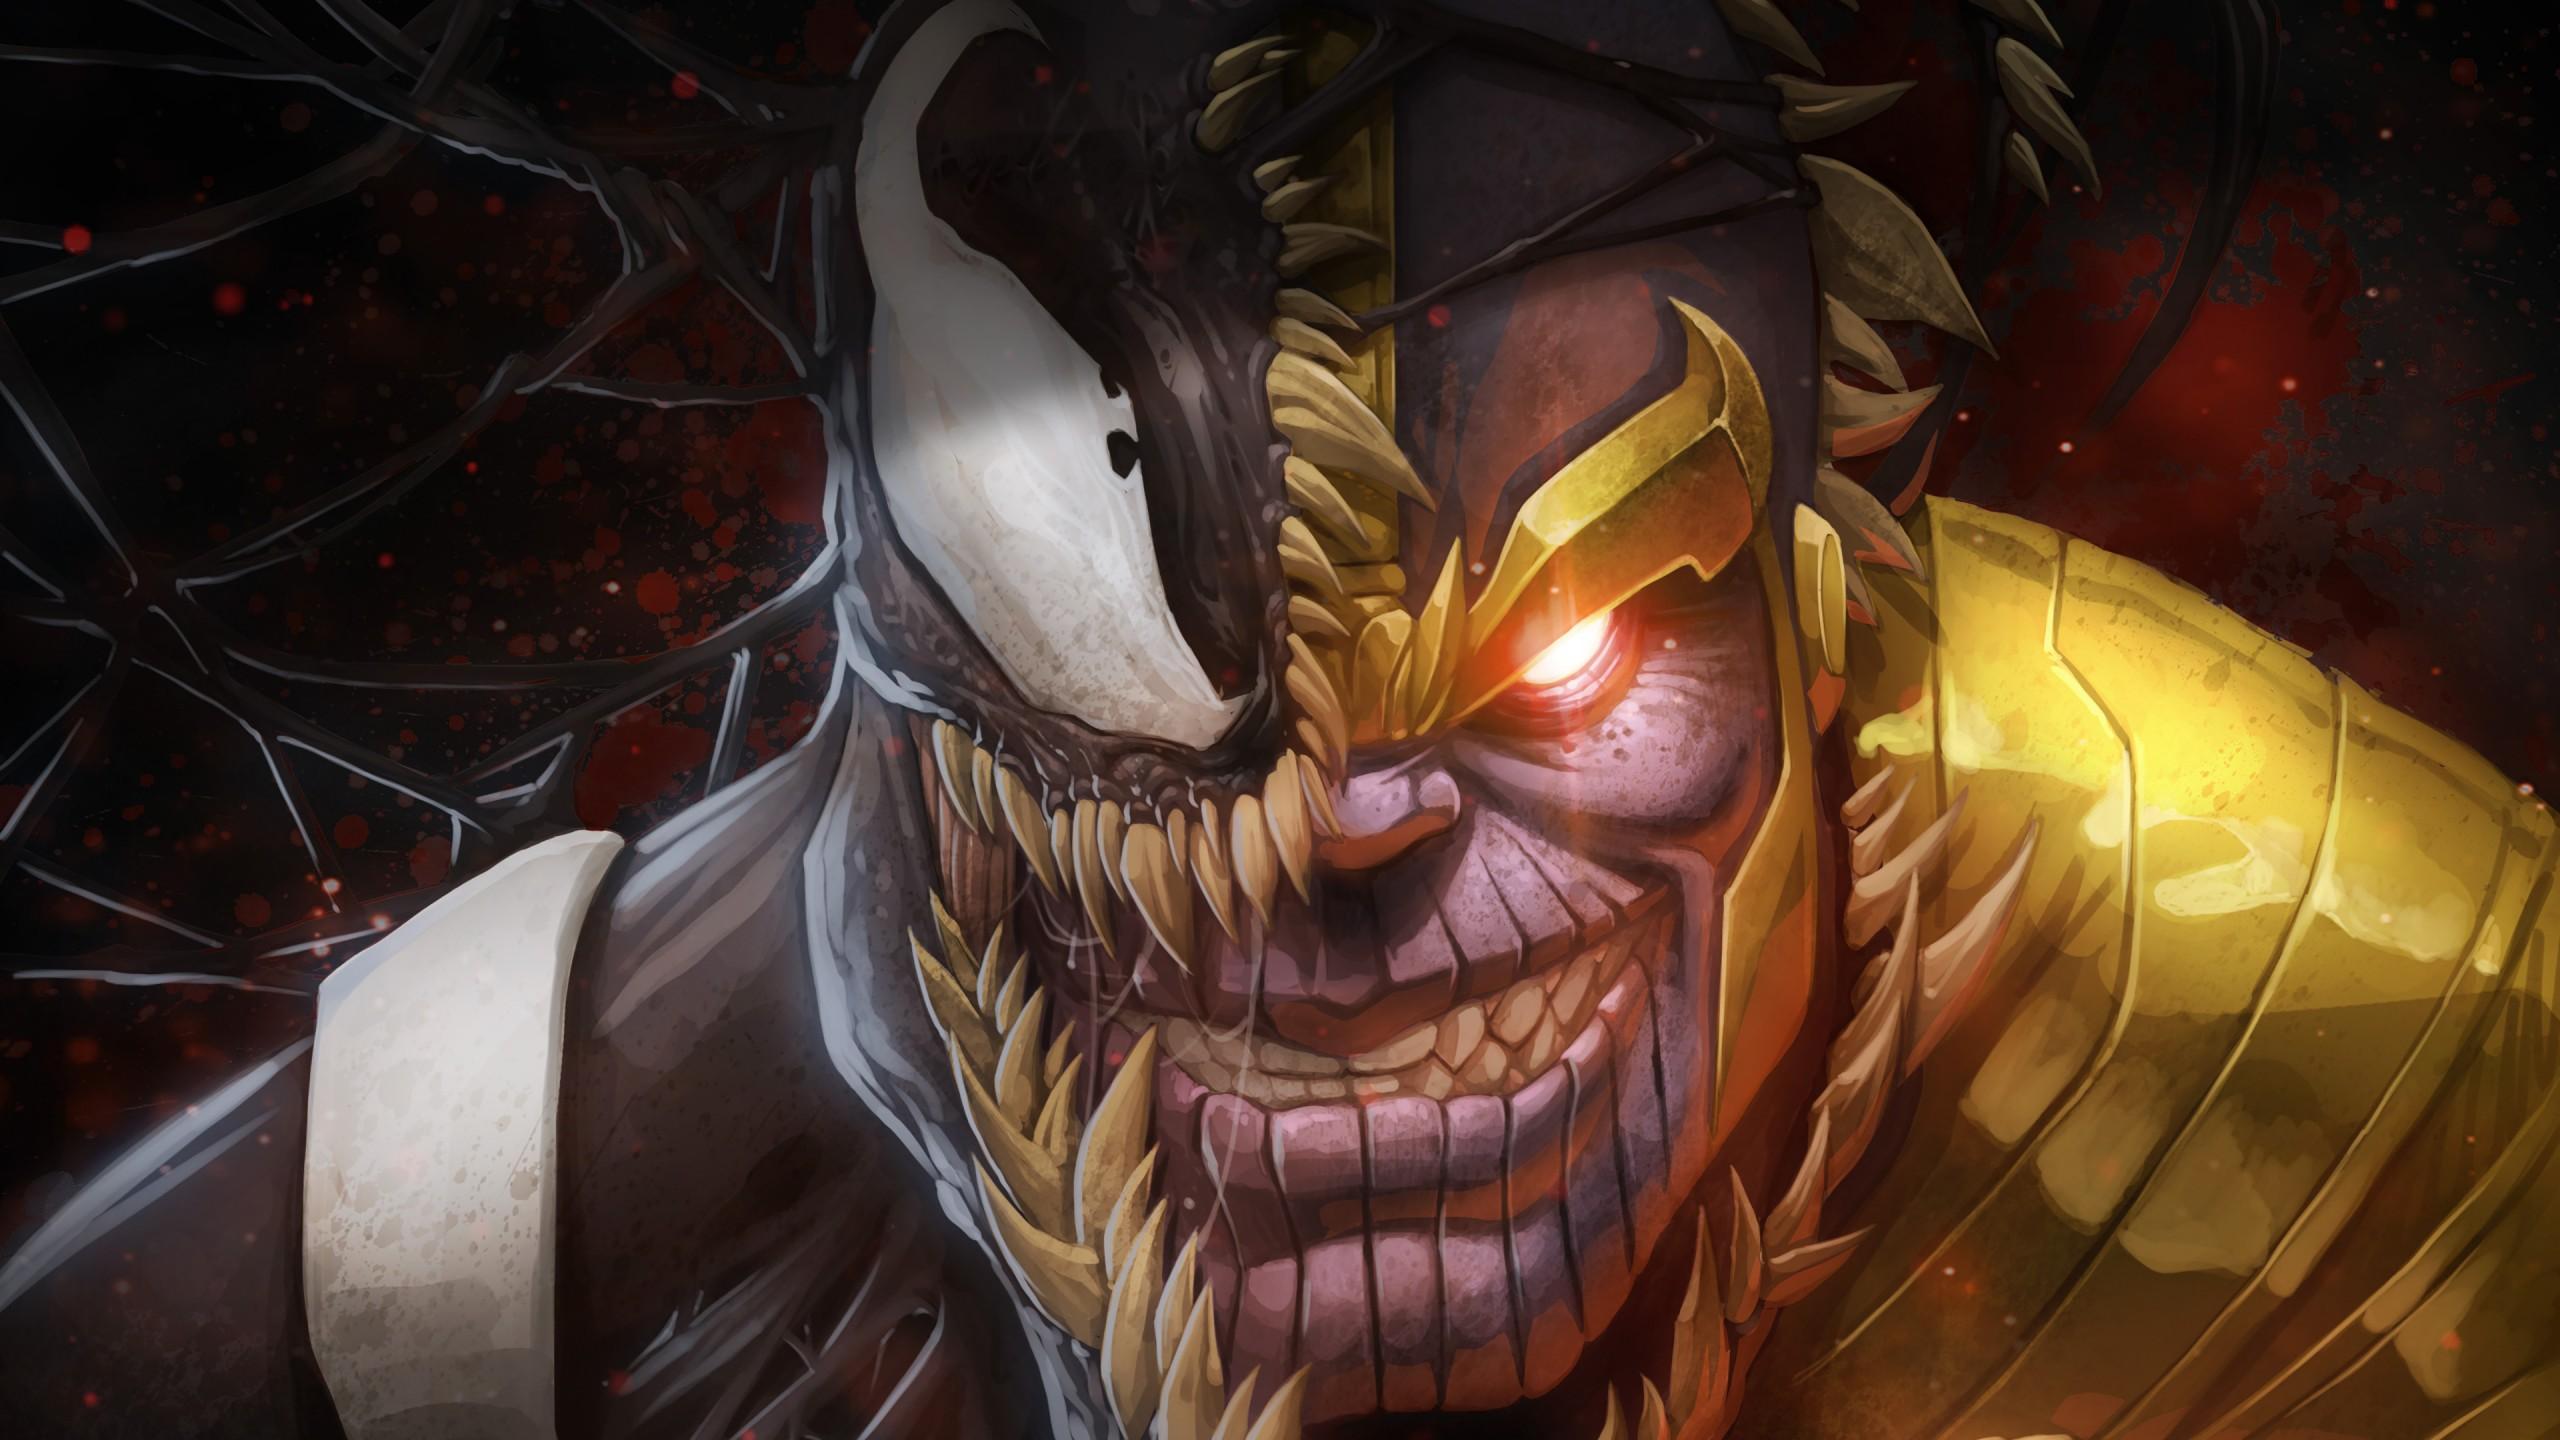 Thanos Wallpaper Iphone X Thanos Amp Venom Artwork Wallpapers Hd Wallpapers Id 24322